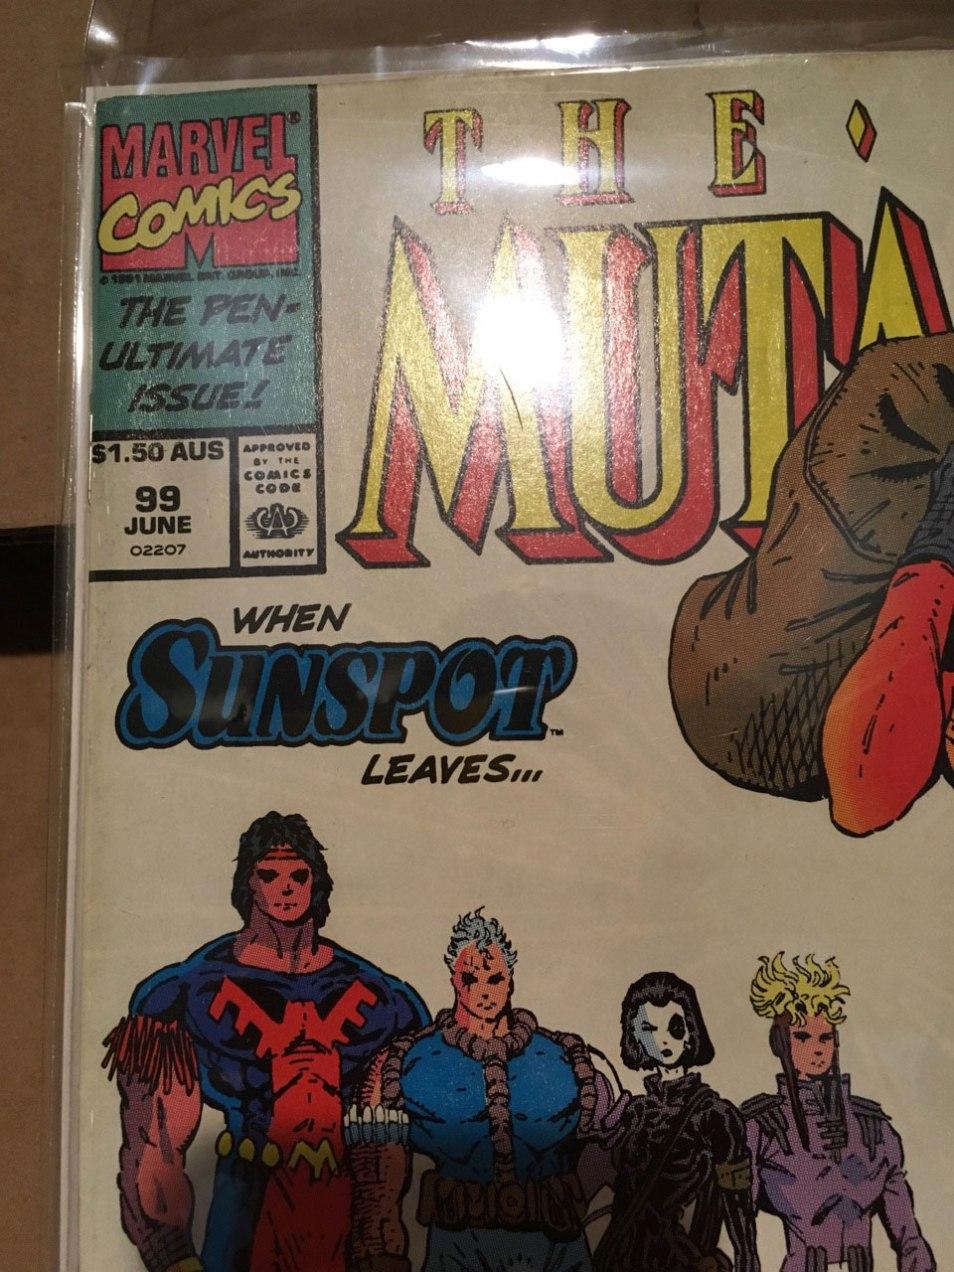 New Mutants #99, $1.50 AUS variant